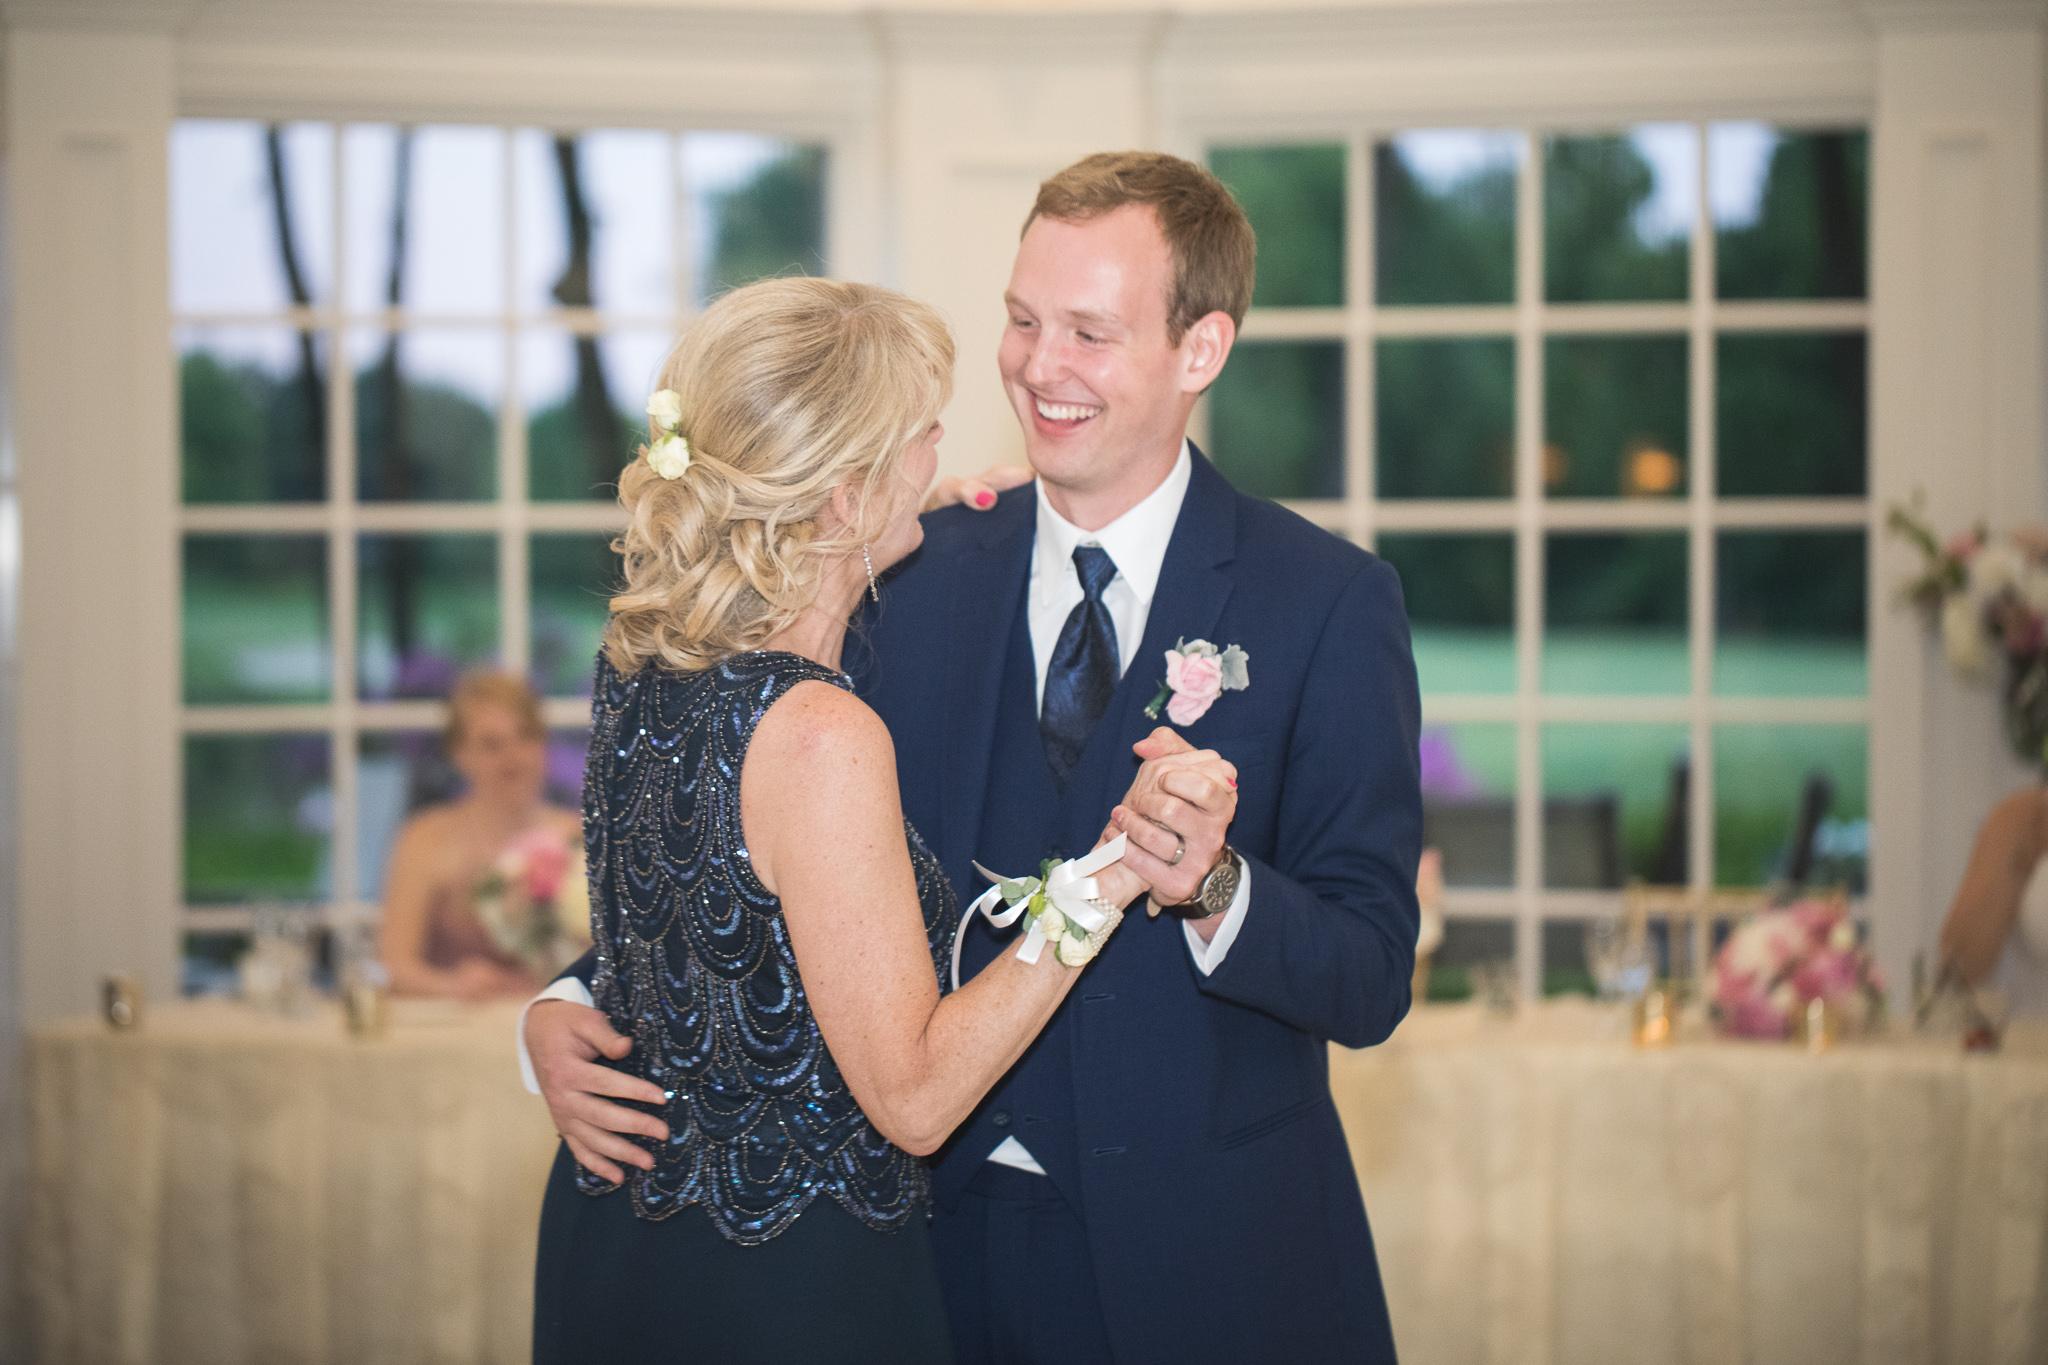 172-best-detroit-michigan-outdoor-wedding-photographer.jpg